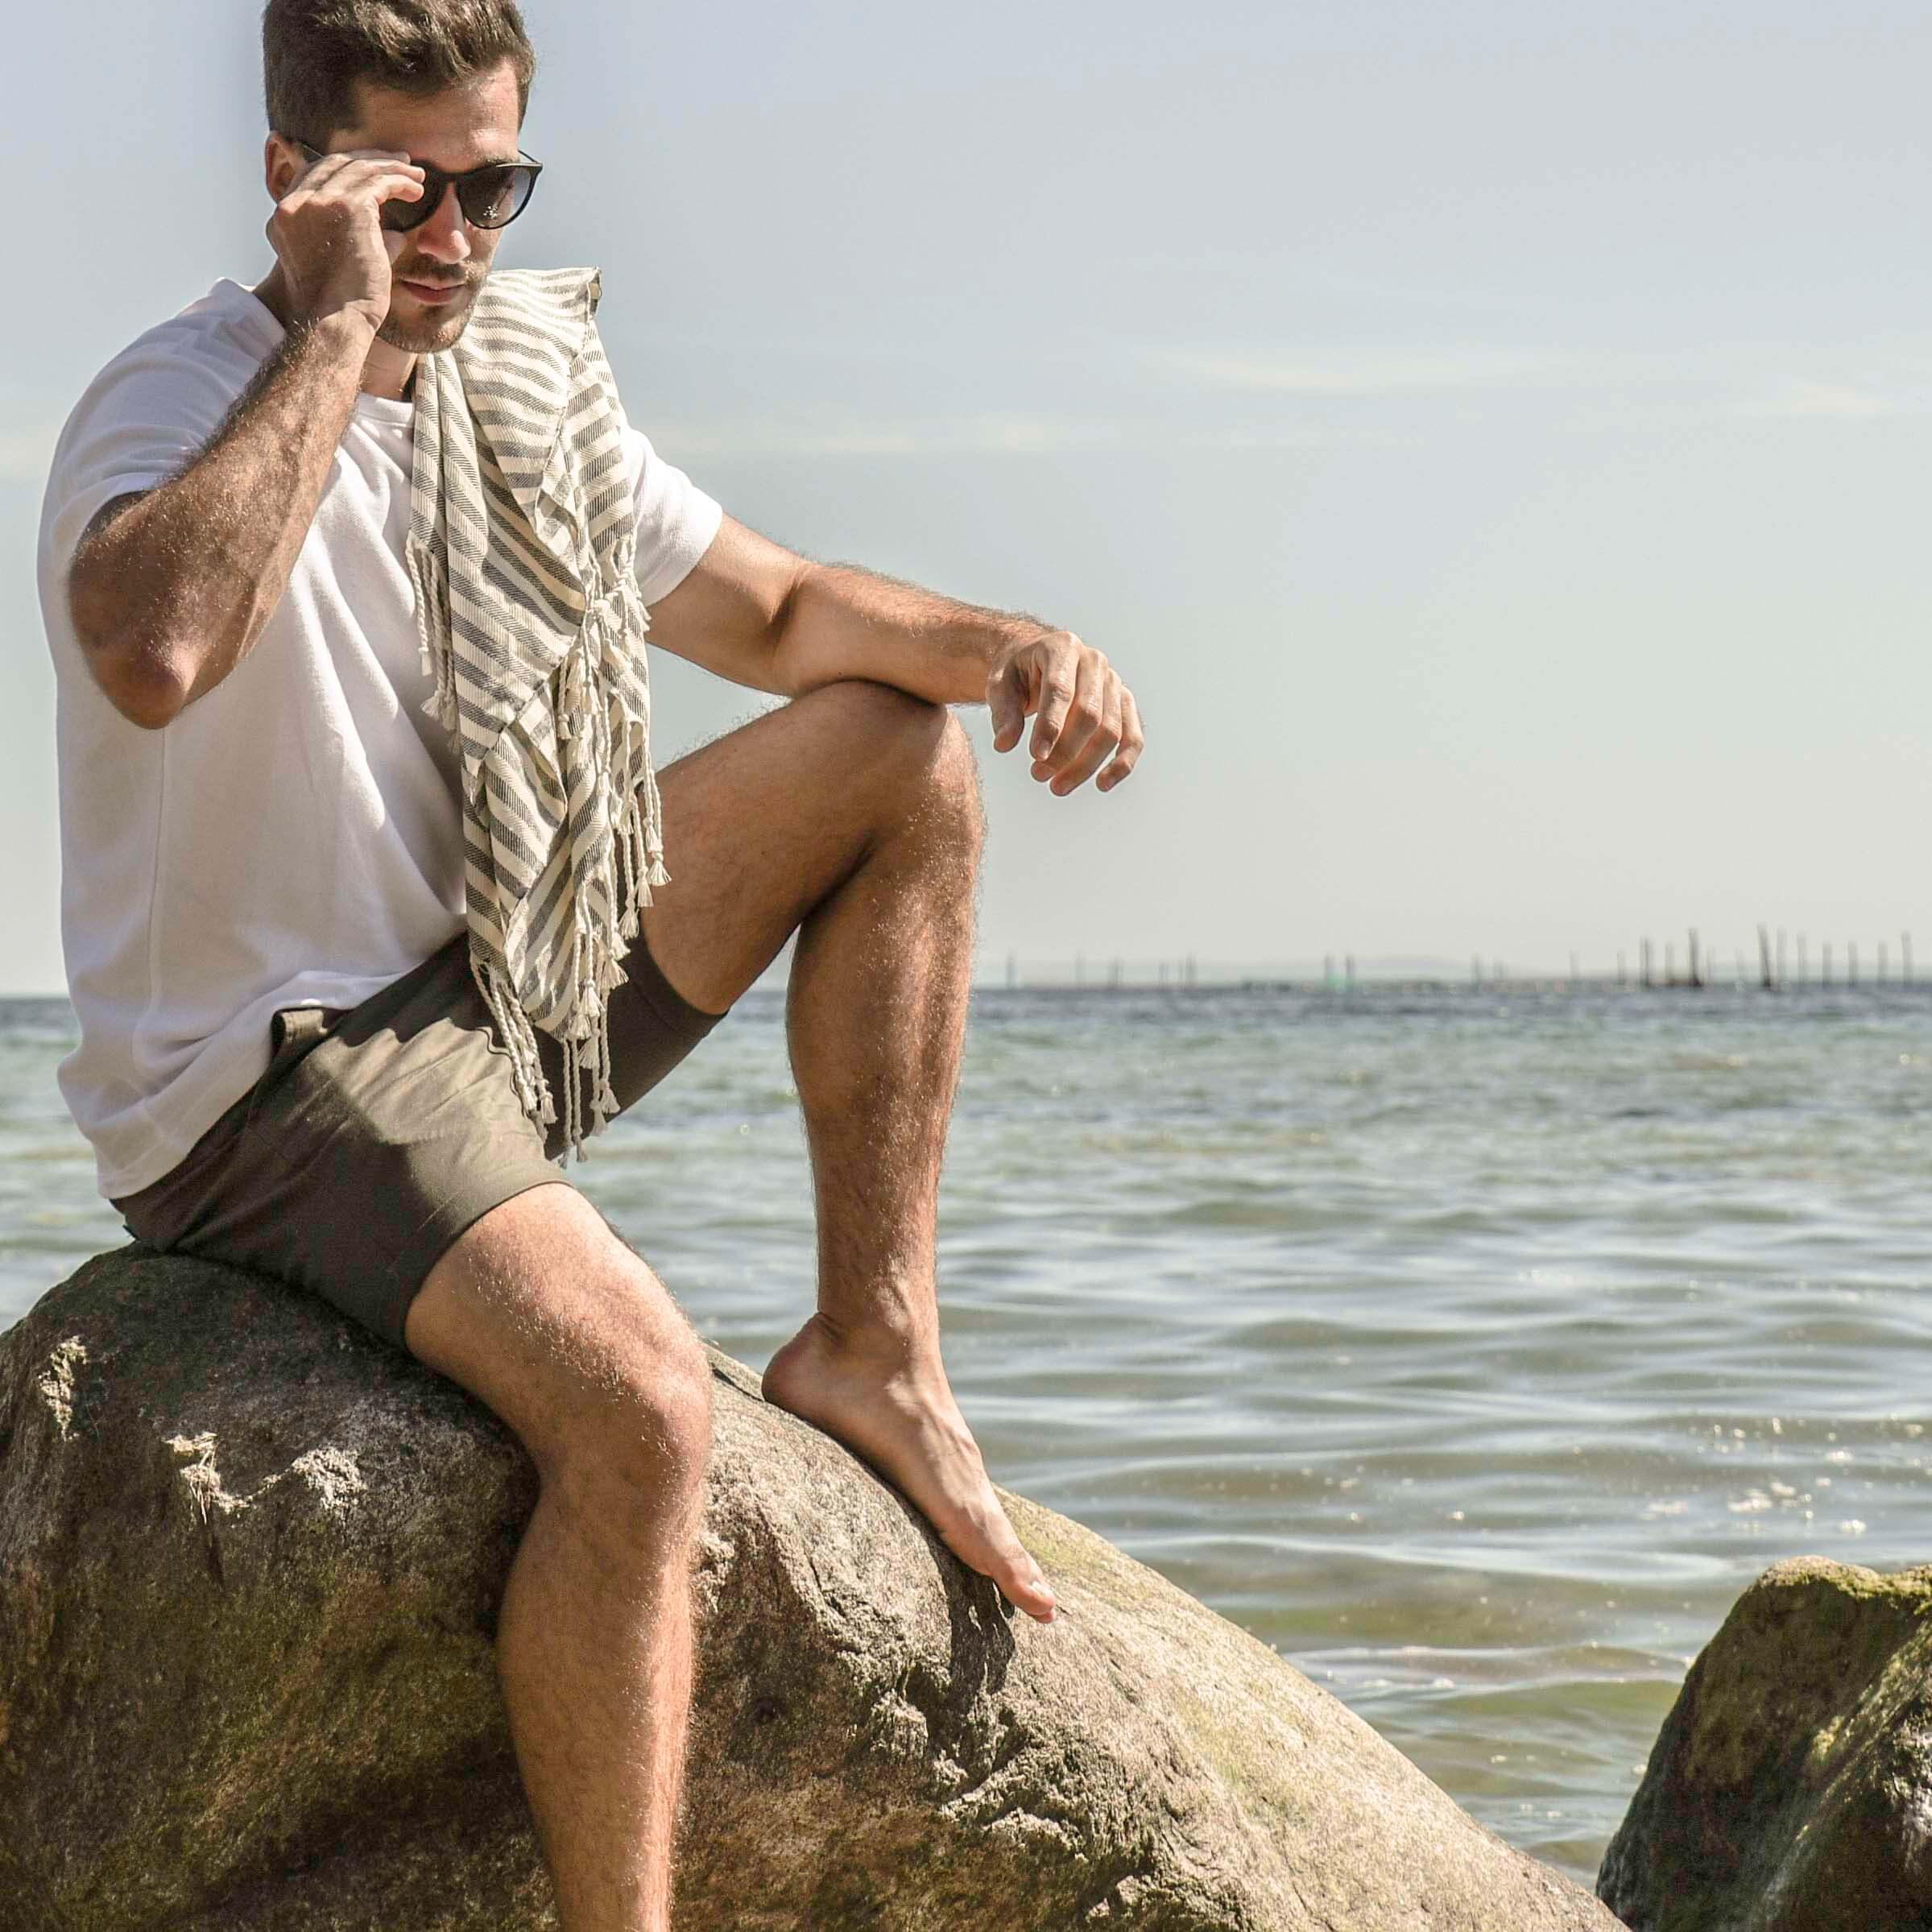 mand med hammam håndklæde over skulderen på solrig strand